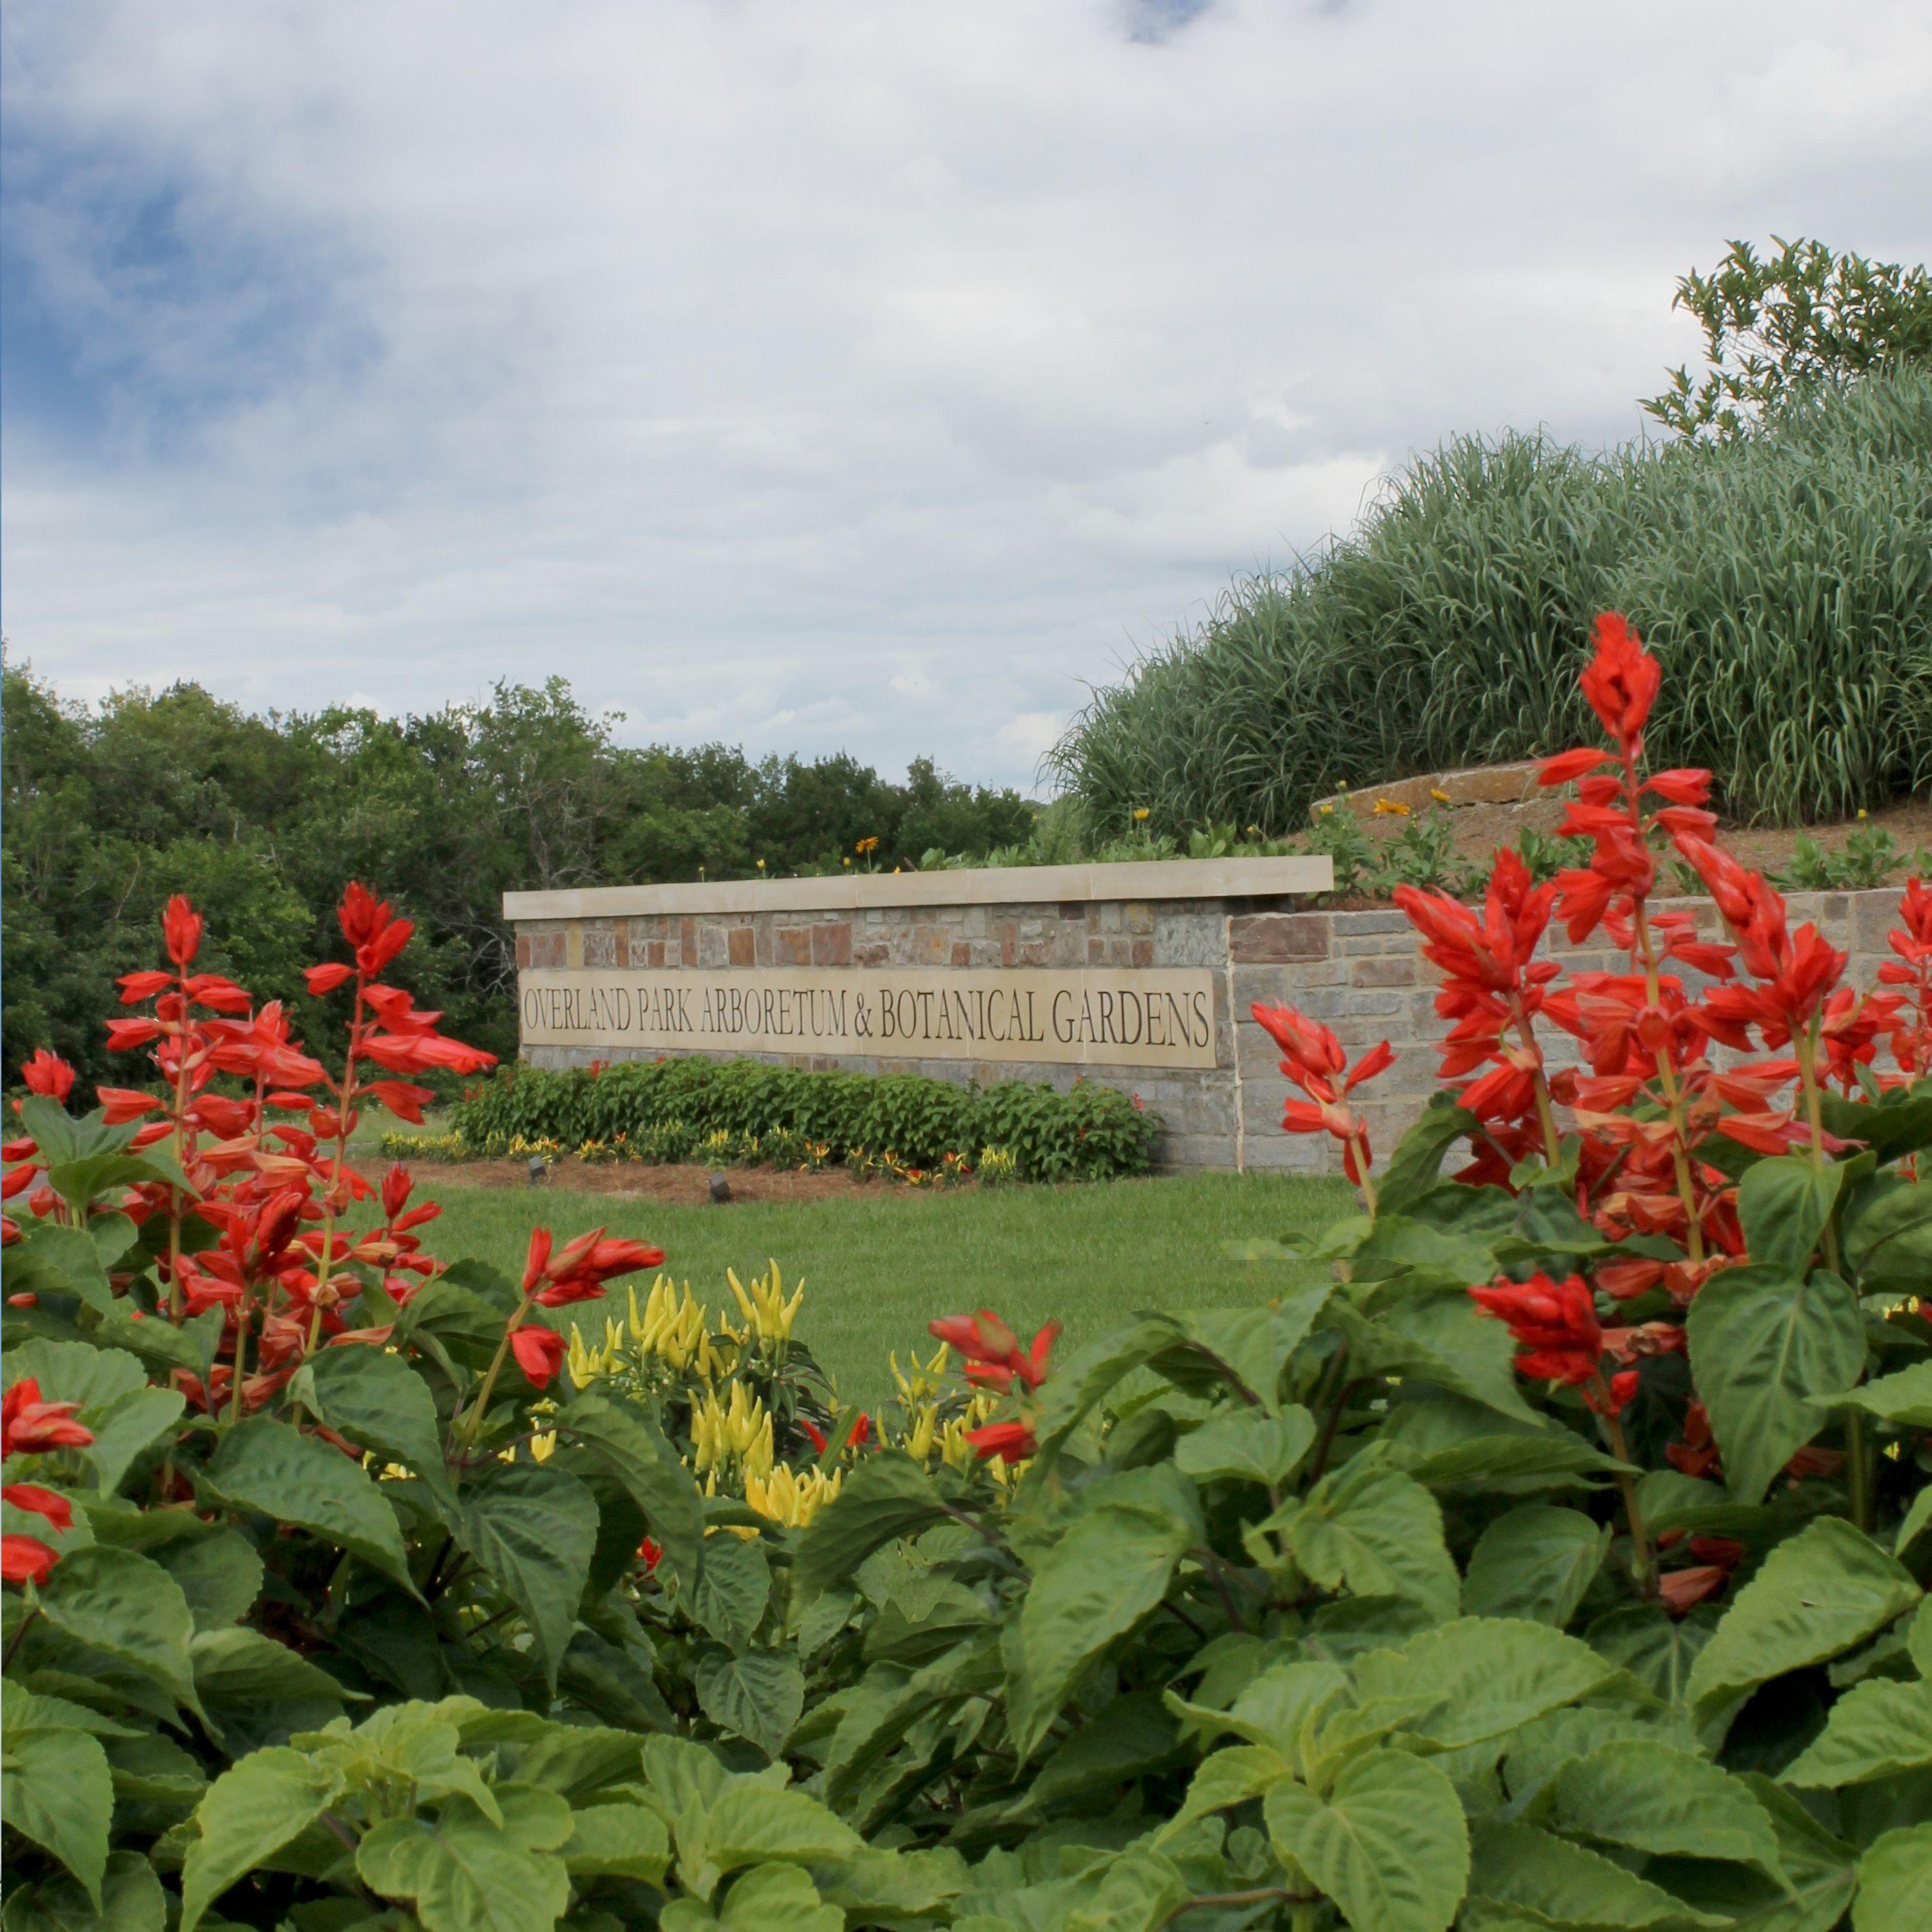 Gentil Arboretum And Botanical Gardens City Of Overland Park Kansas